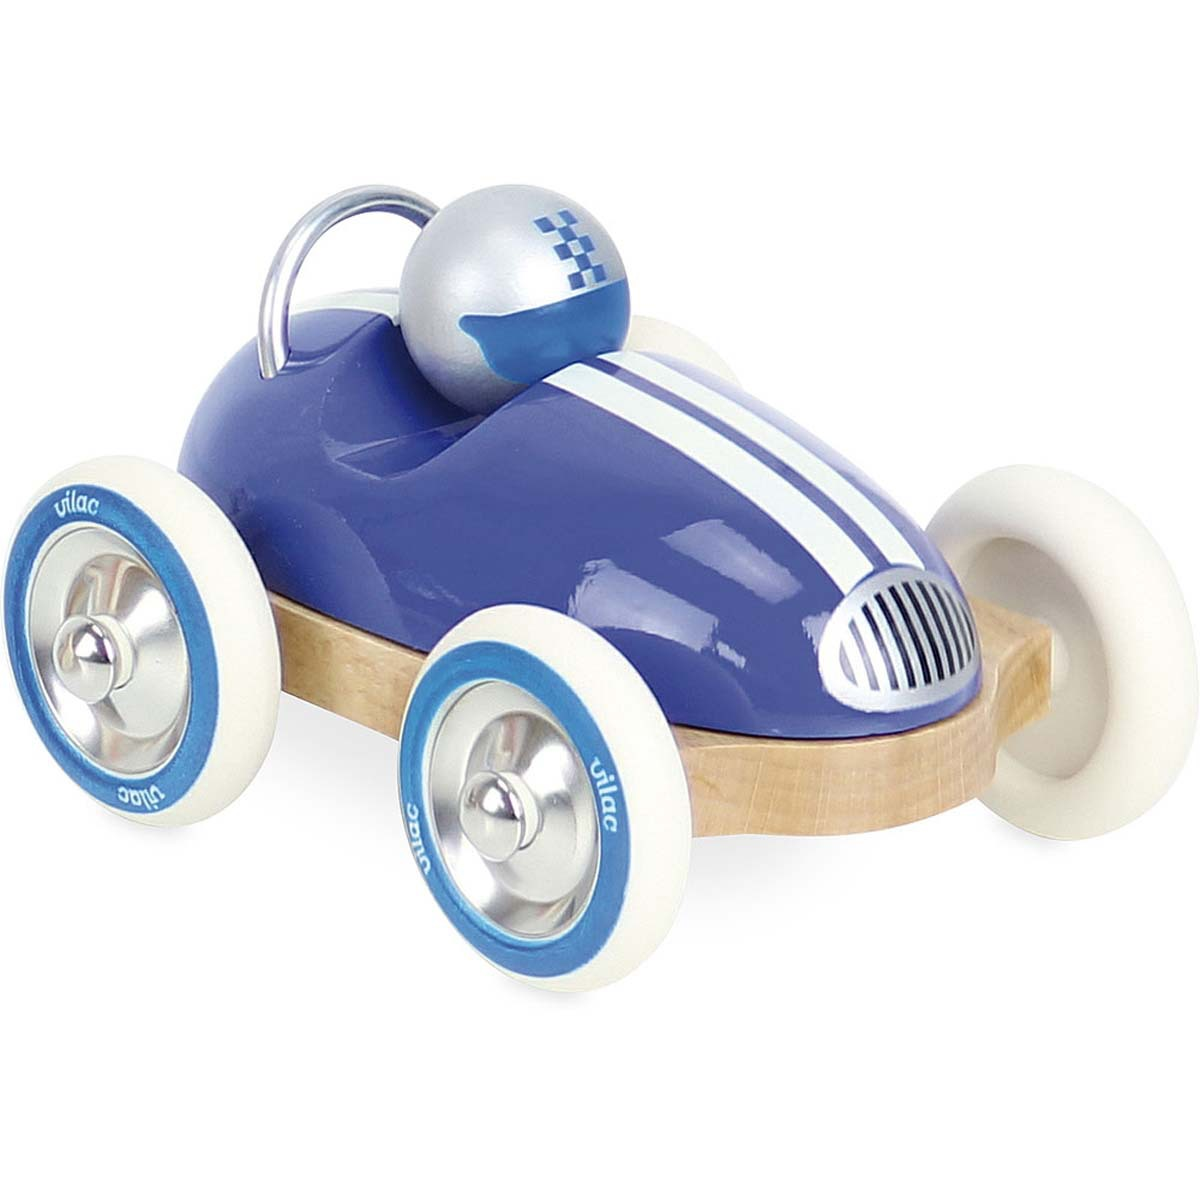 Mes premiers jouets Roadster Vintage - Bleu Roadster Vintage - Bleu